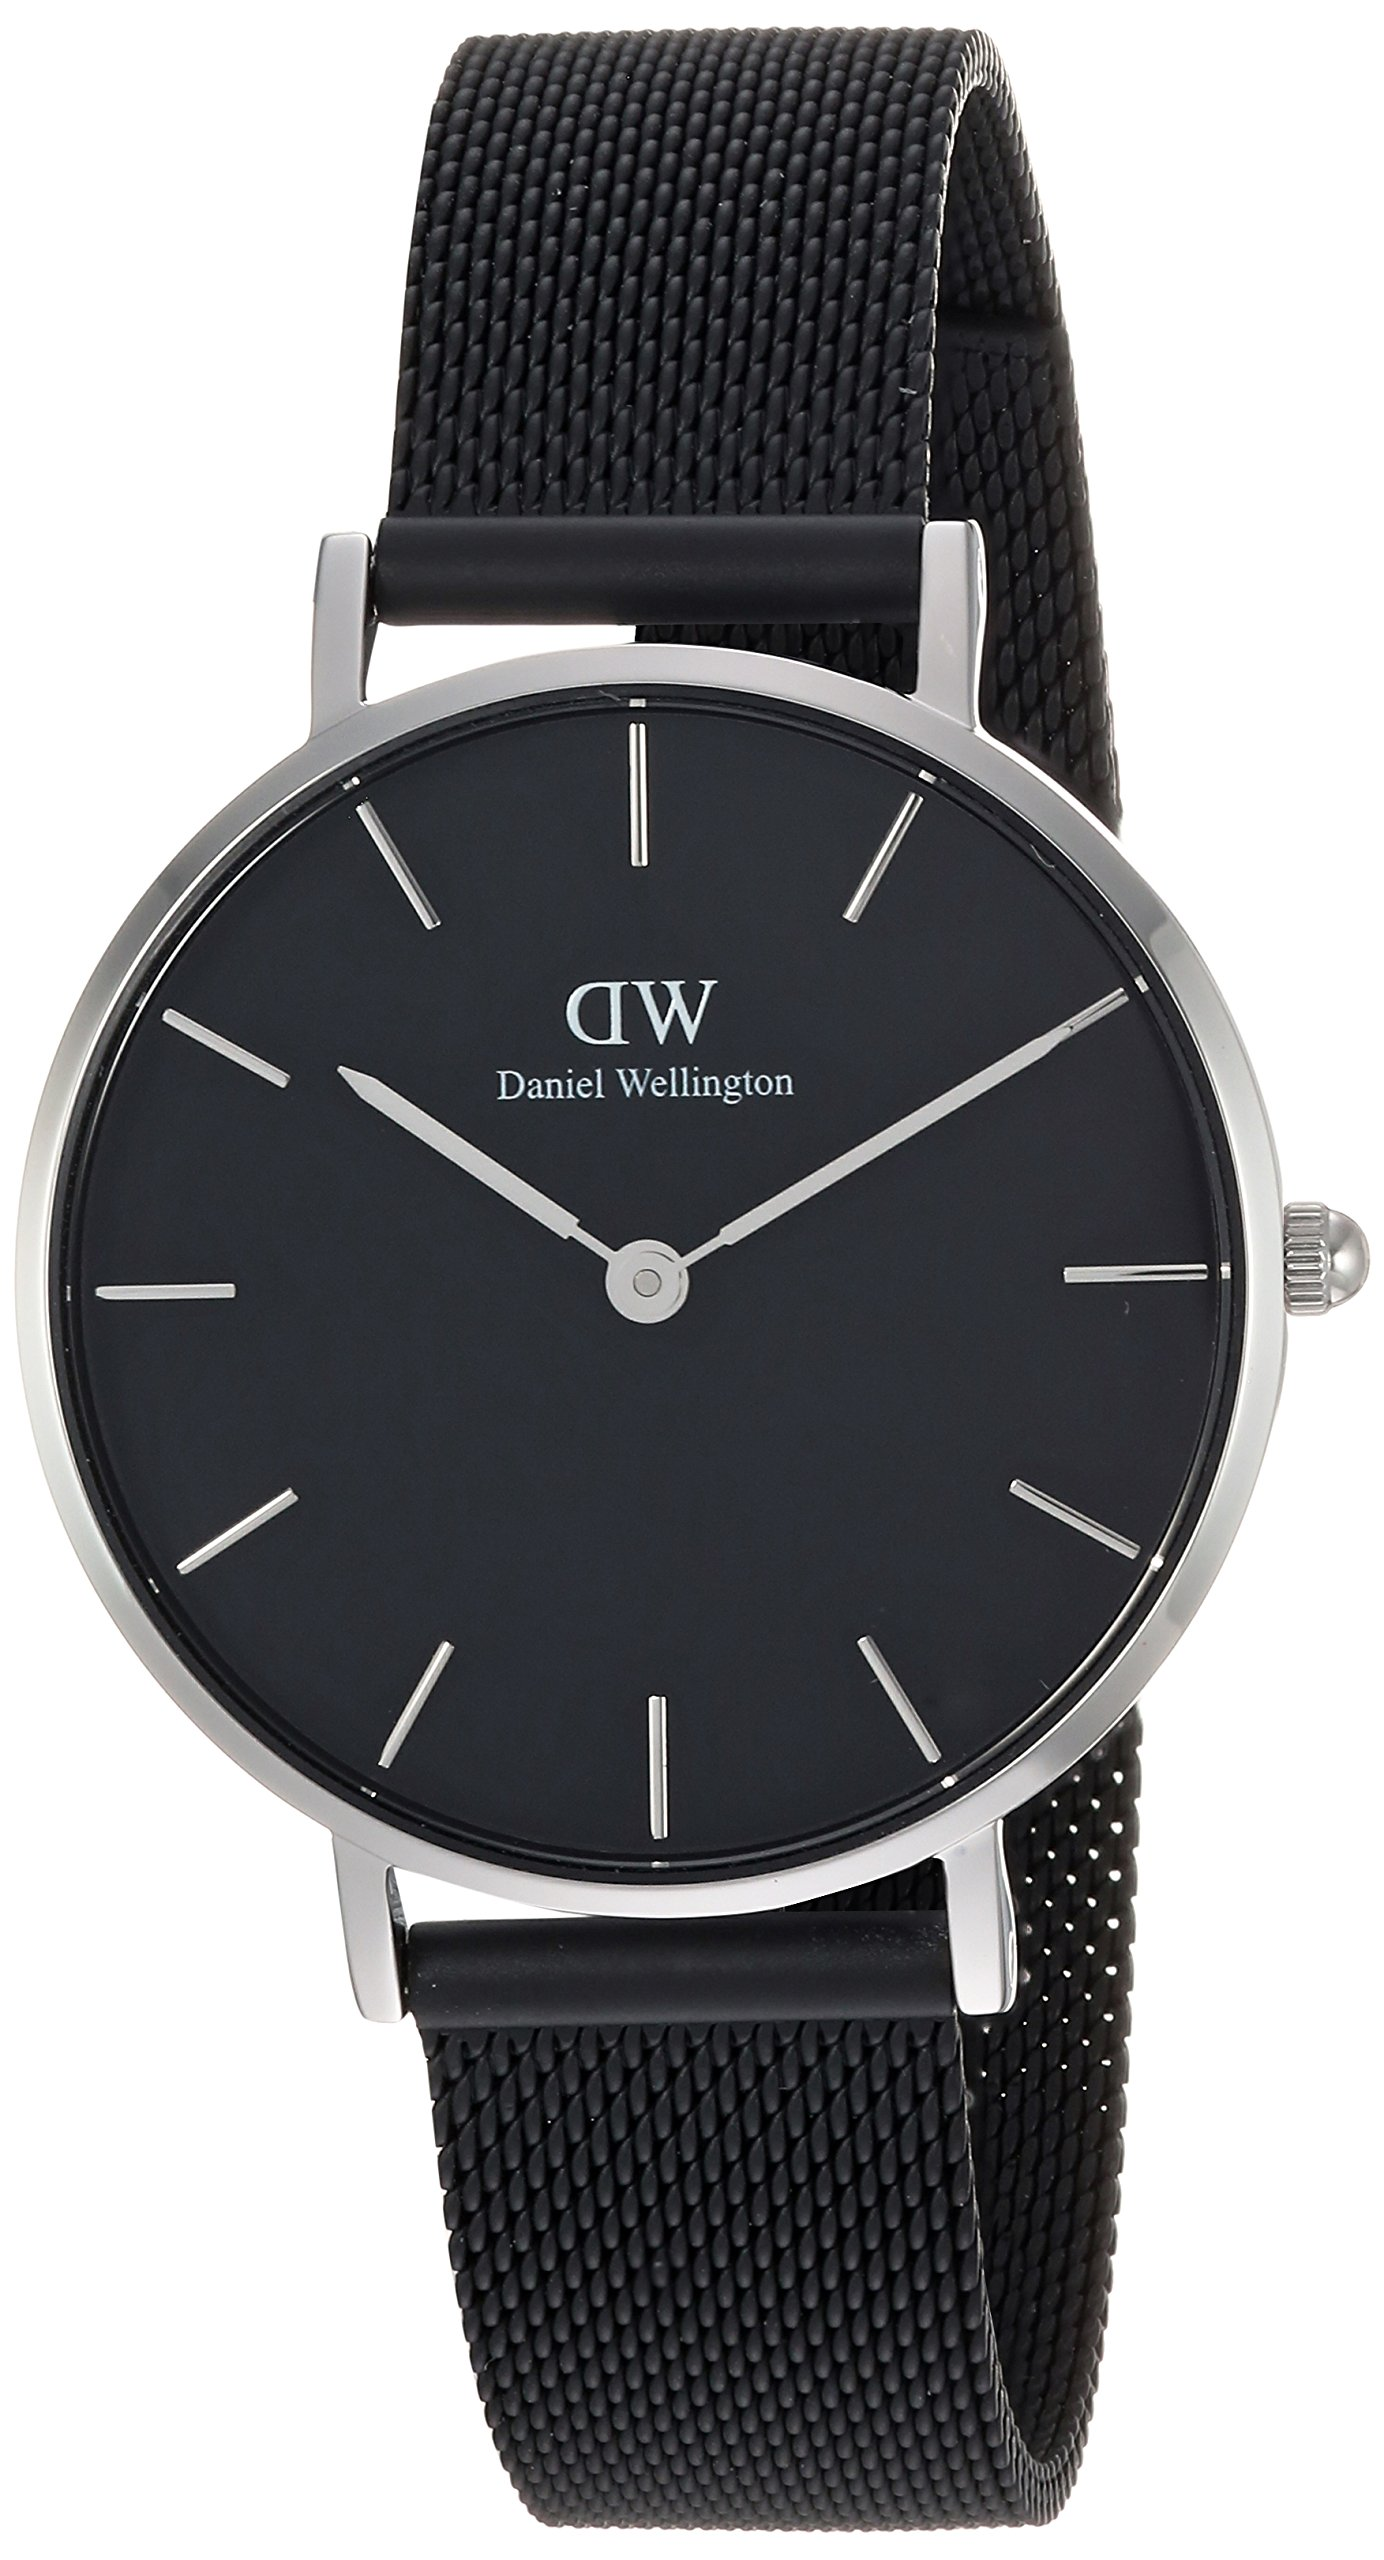 Daniel-Wellington-Damen-Analog-Quarz-Uhr-mit-Edelstahl-Armband-DW00100202